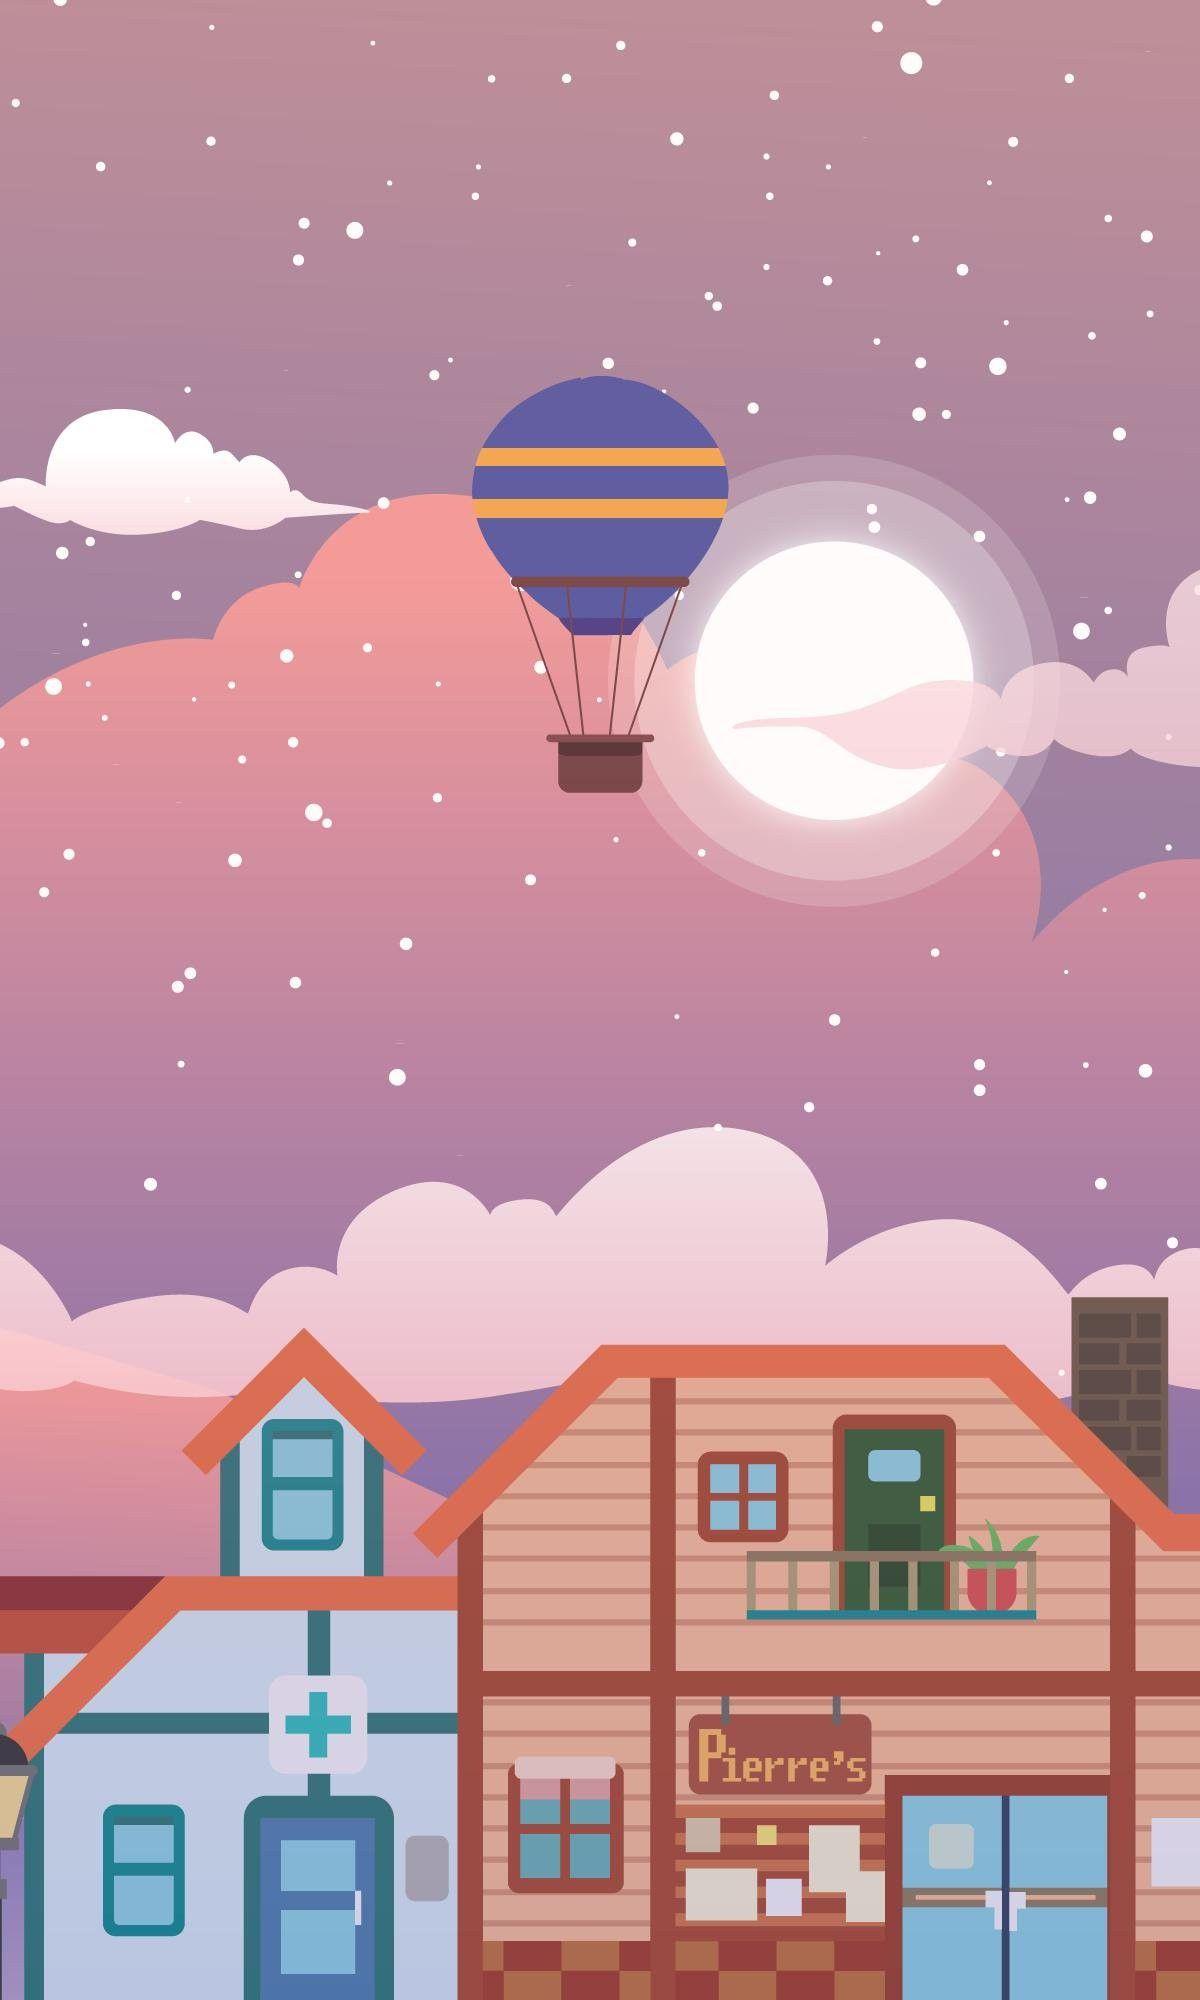 Stardew Valley Art Hot Air Balloon Ride Over Pelican Town Pierre S General Store Harvey S Clinic P Stardew Valley Stardew Valley Fanart Nerdy Wallpaper